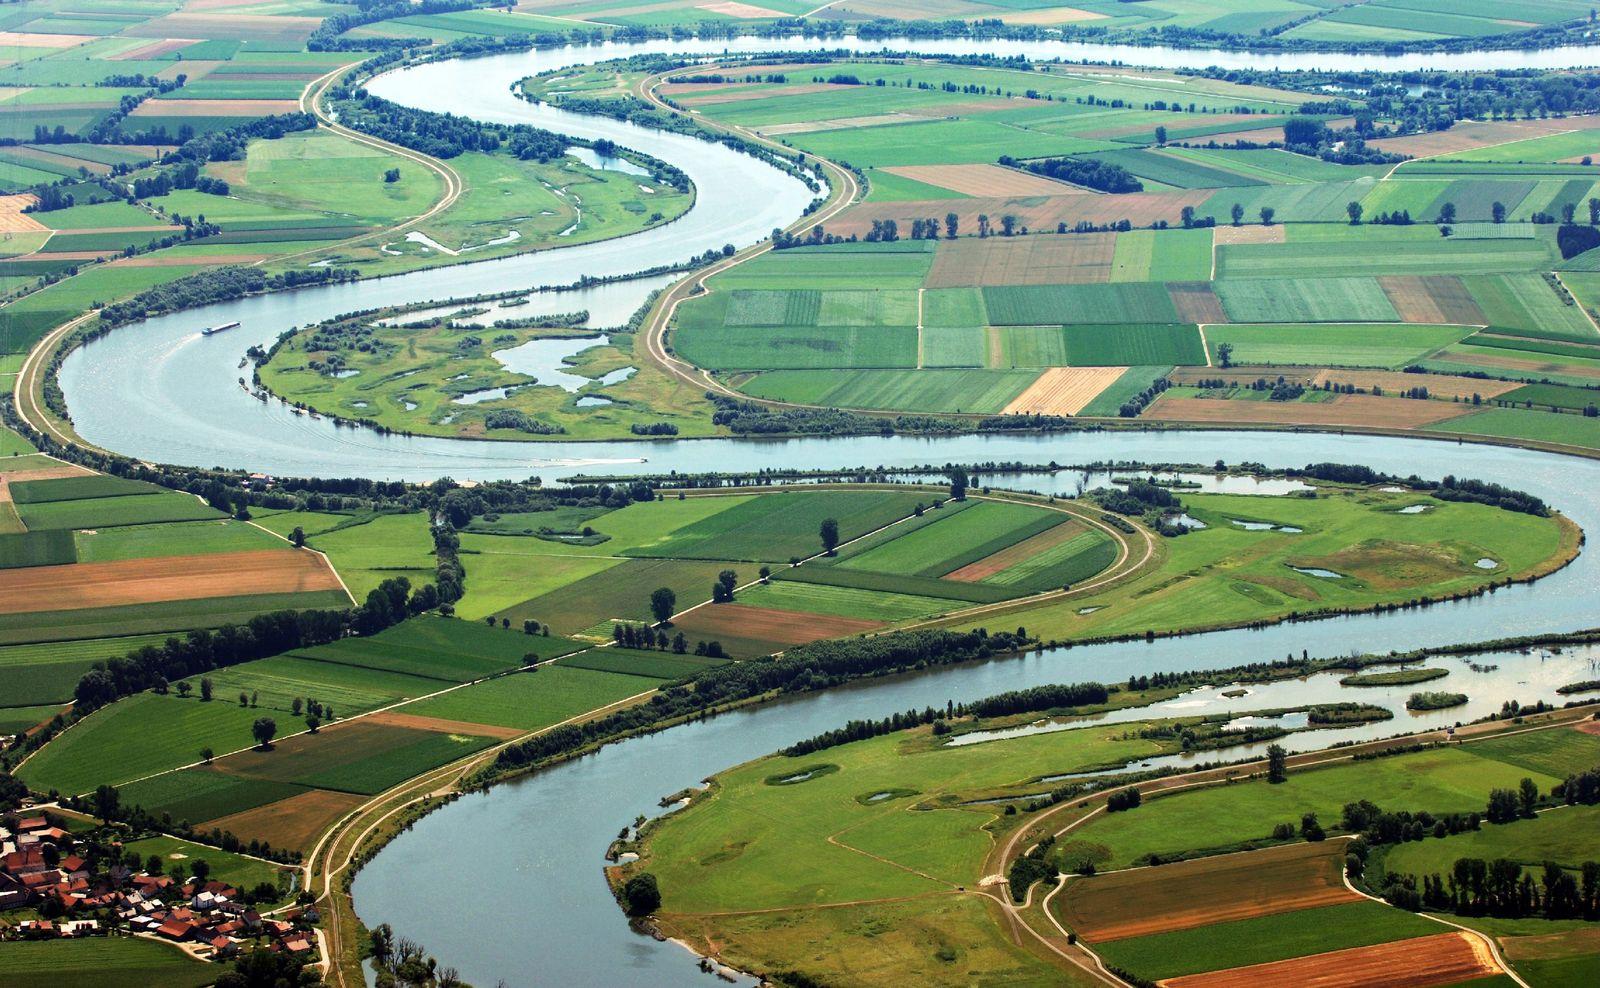 Donau / bedrohter Fluss Europas